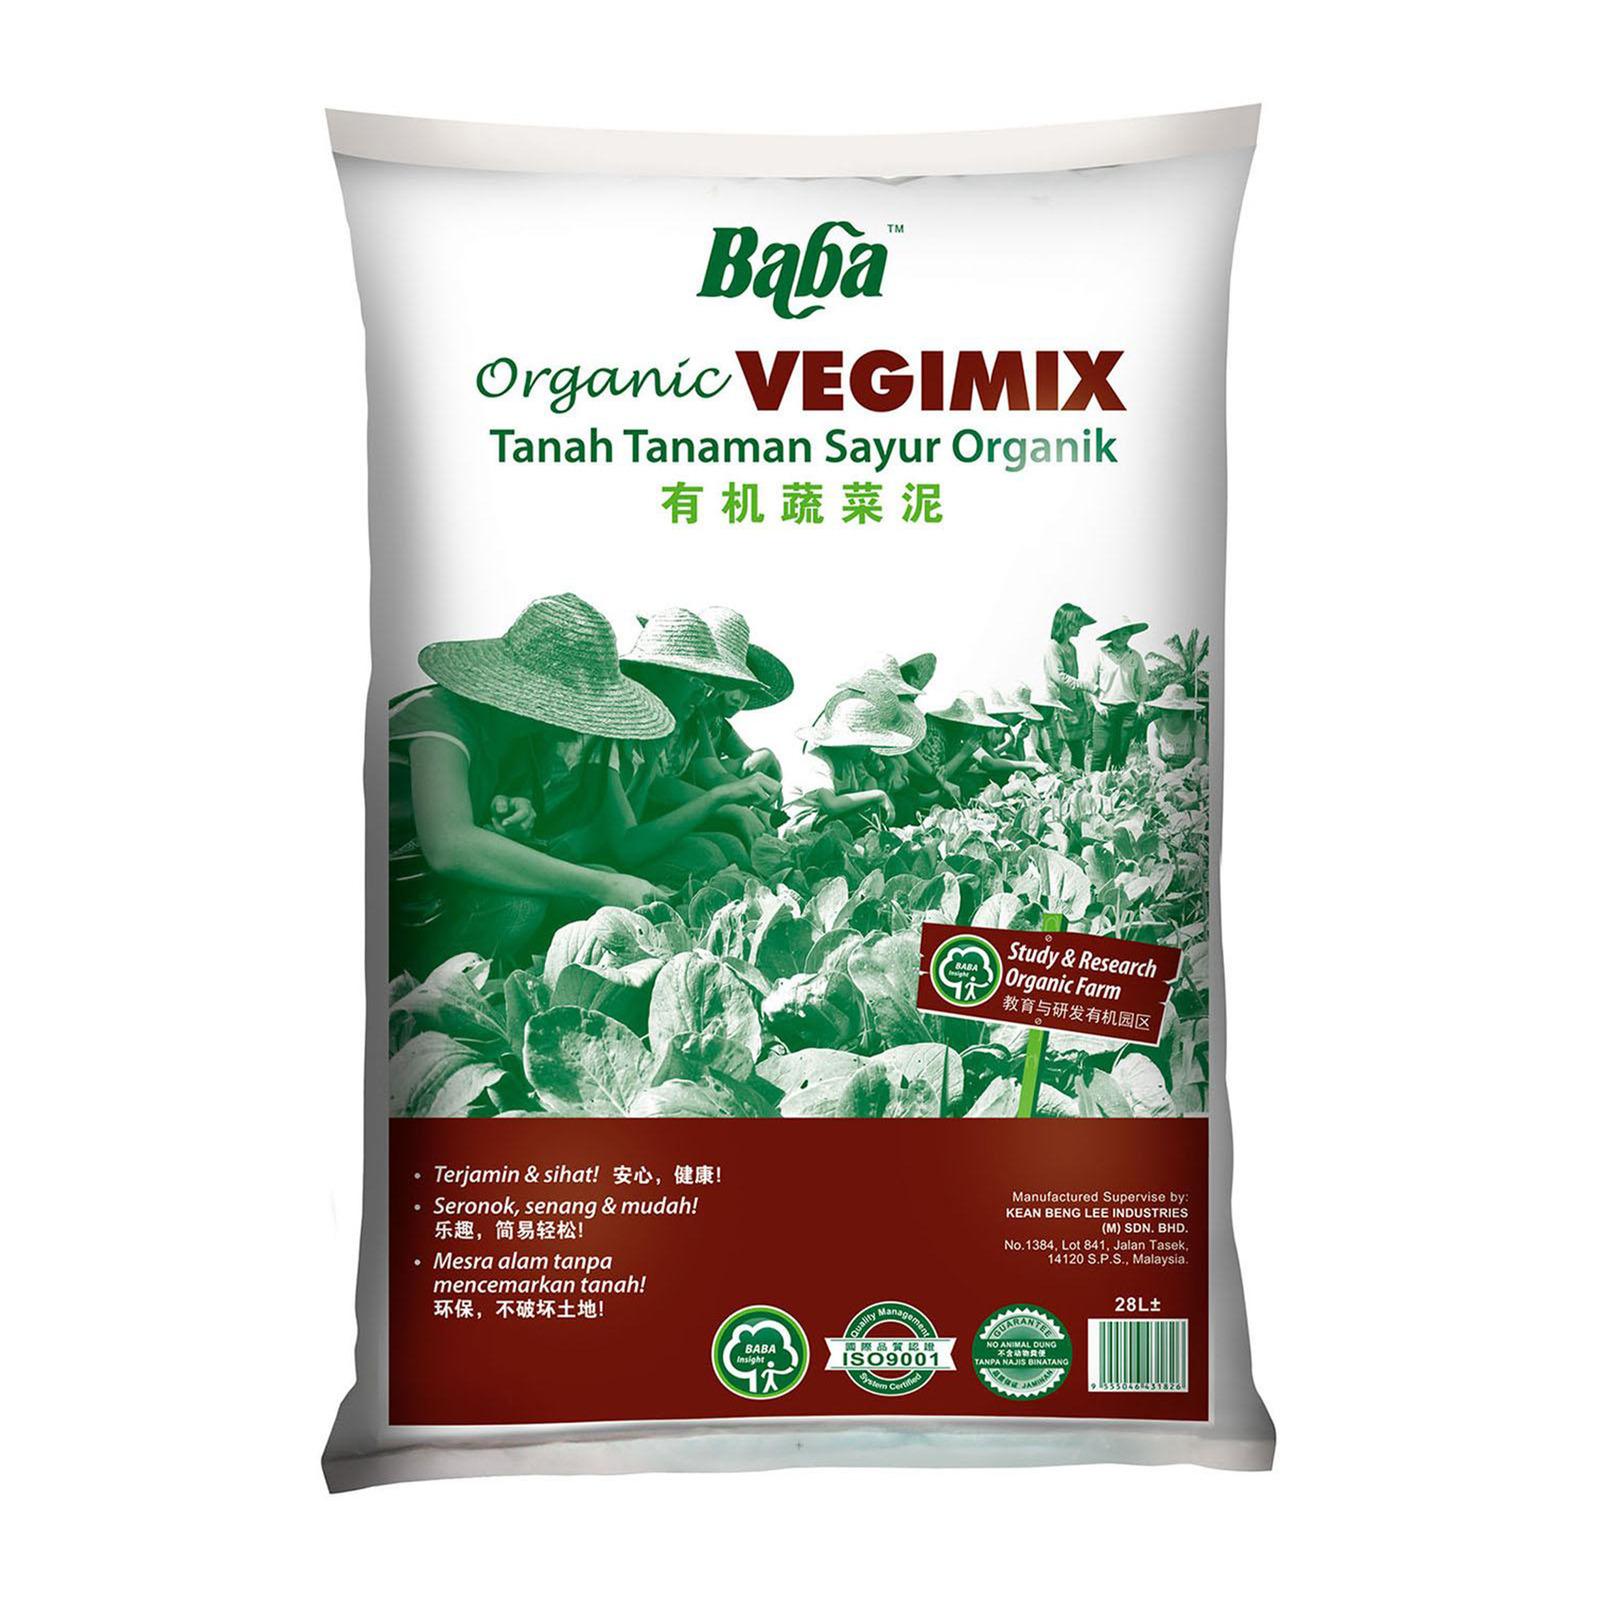 Baba Organic Vegimix Soil